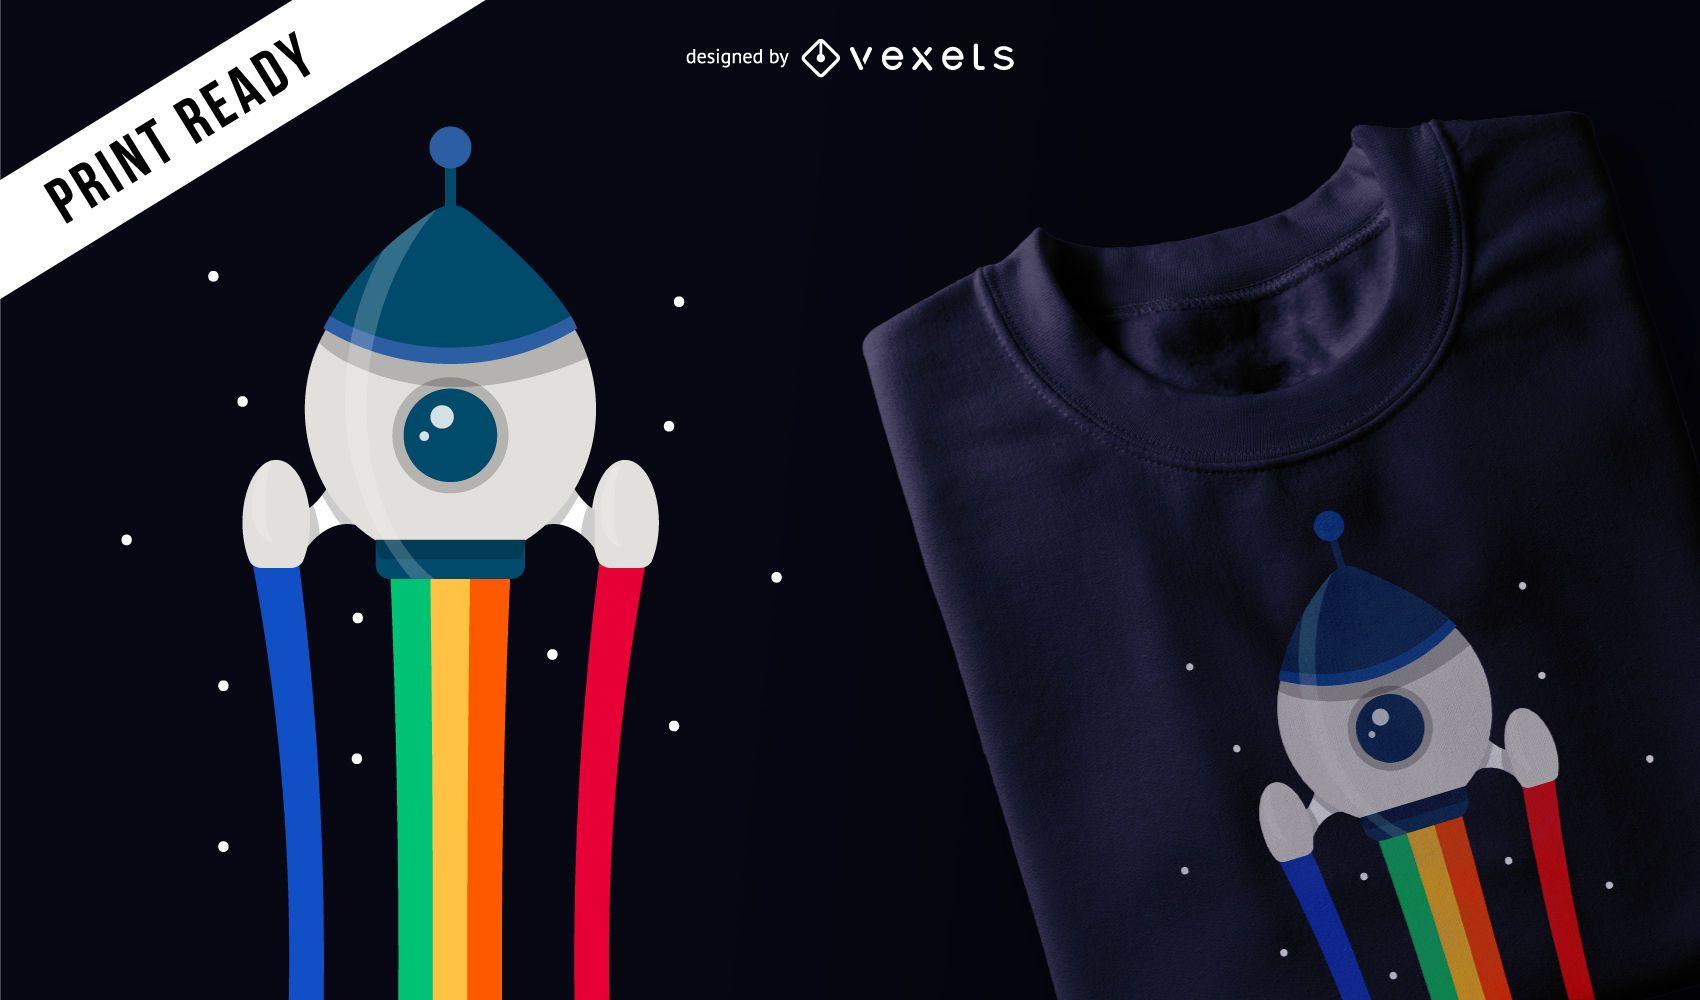 Space rocket t-shirt design